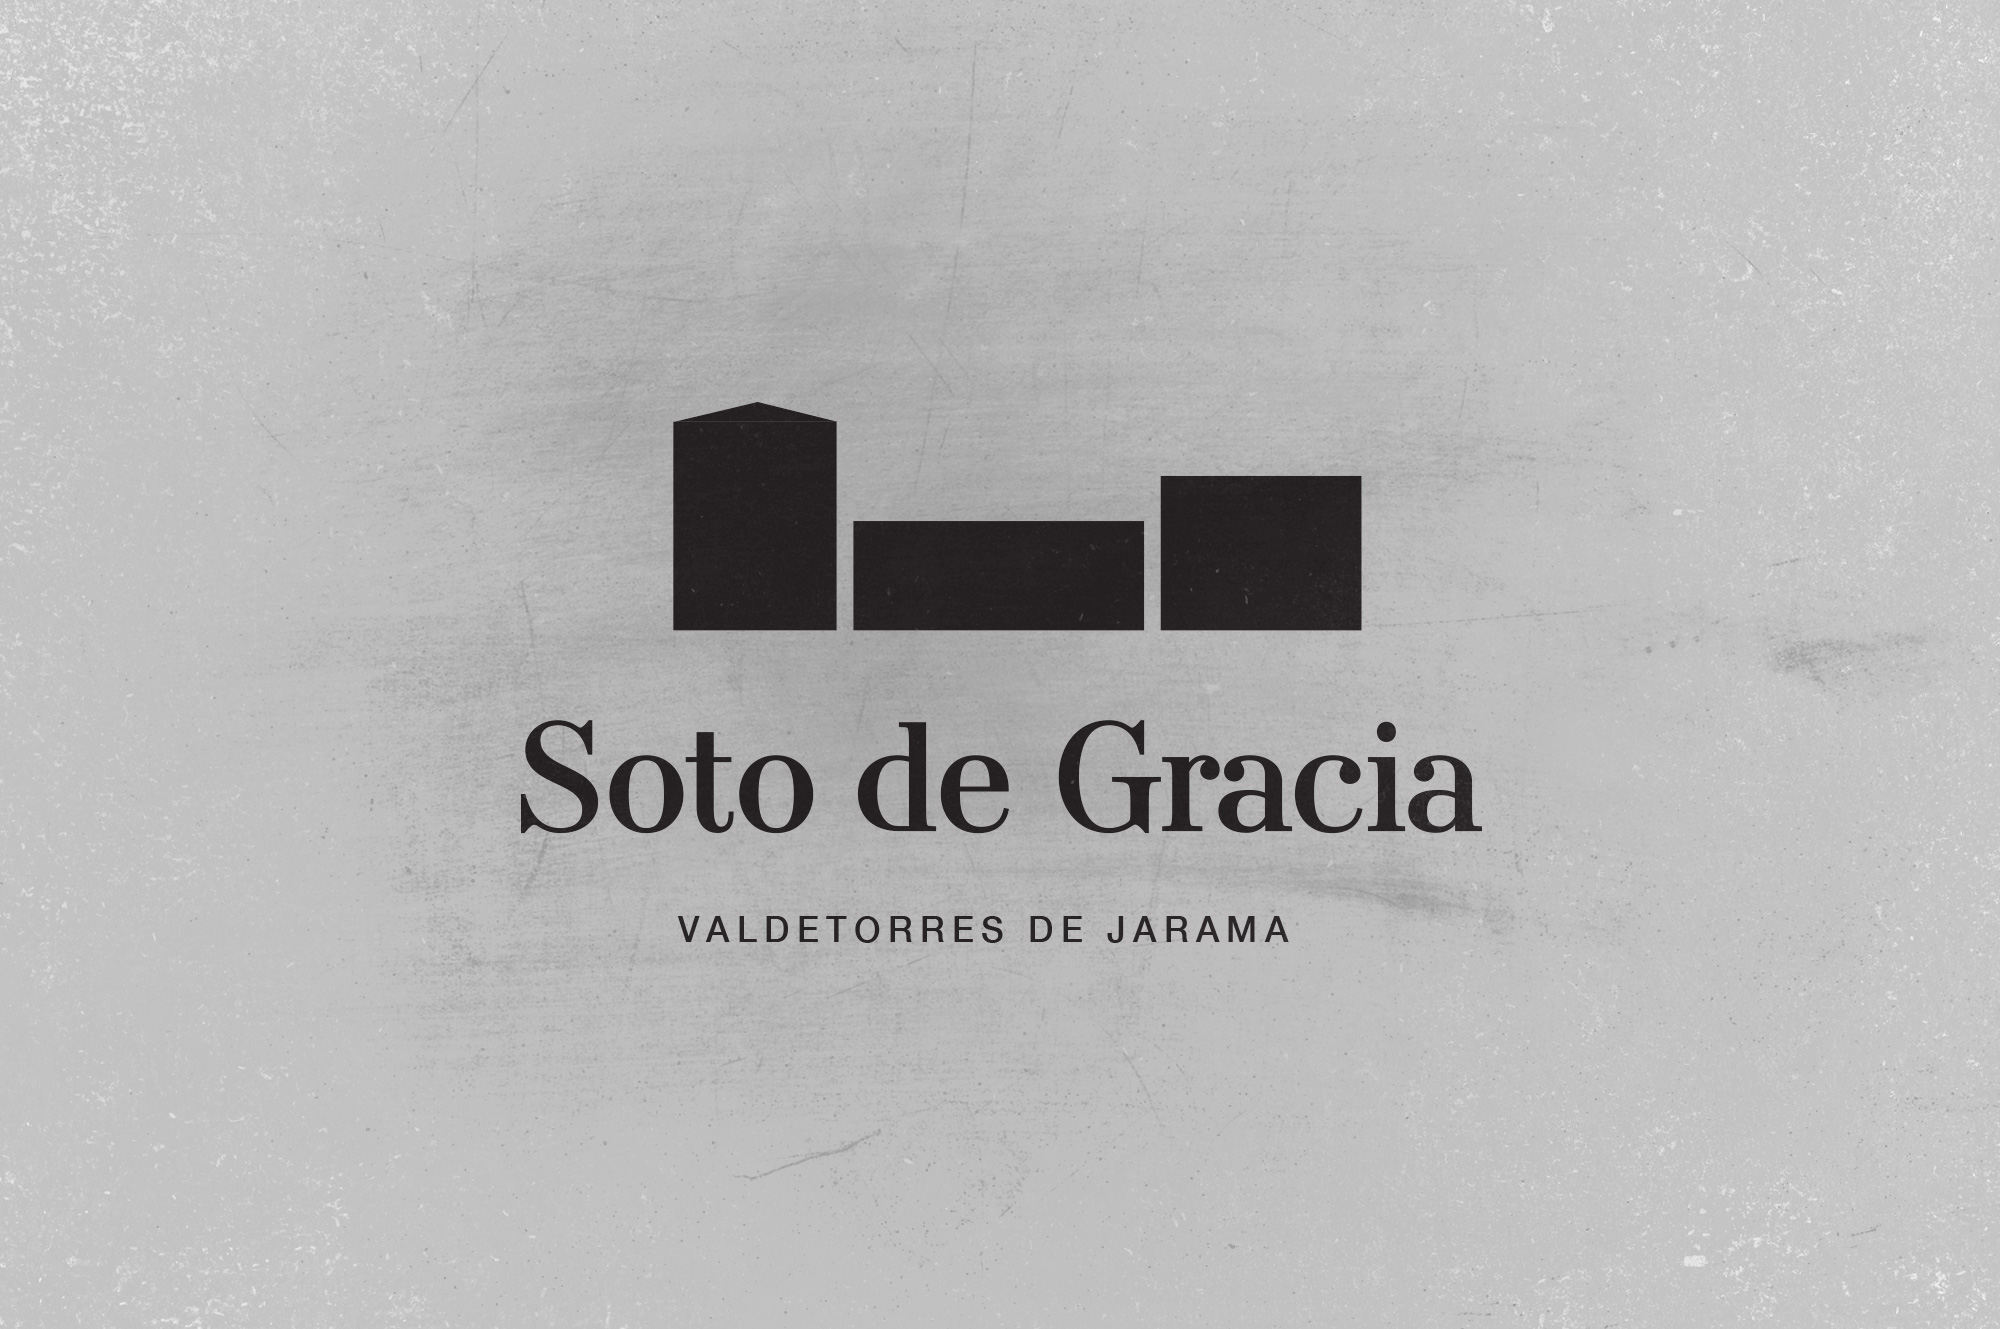 soto-de-gracia-logo-geometrico